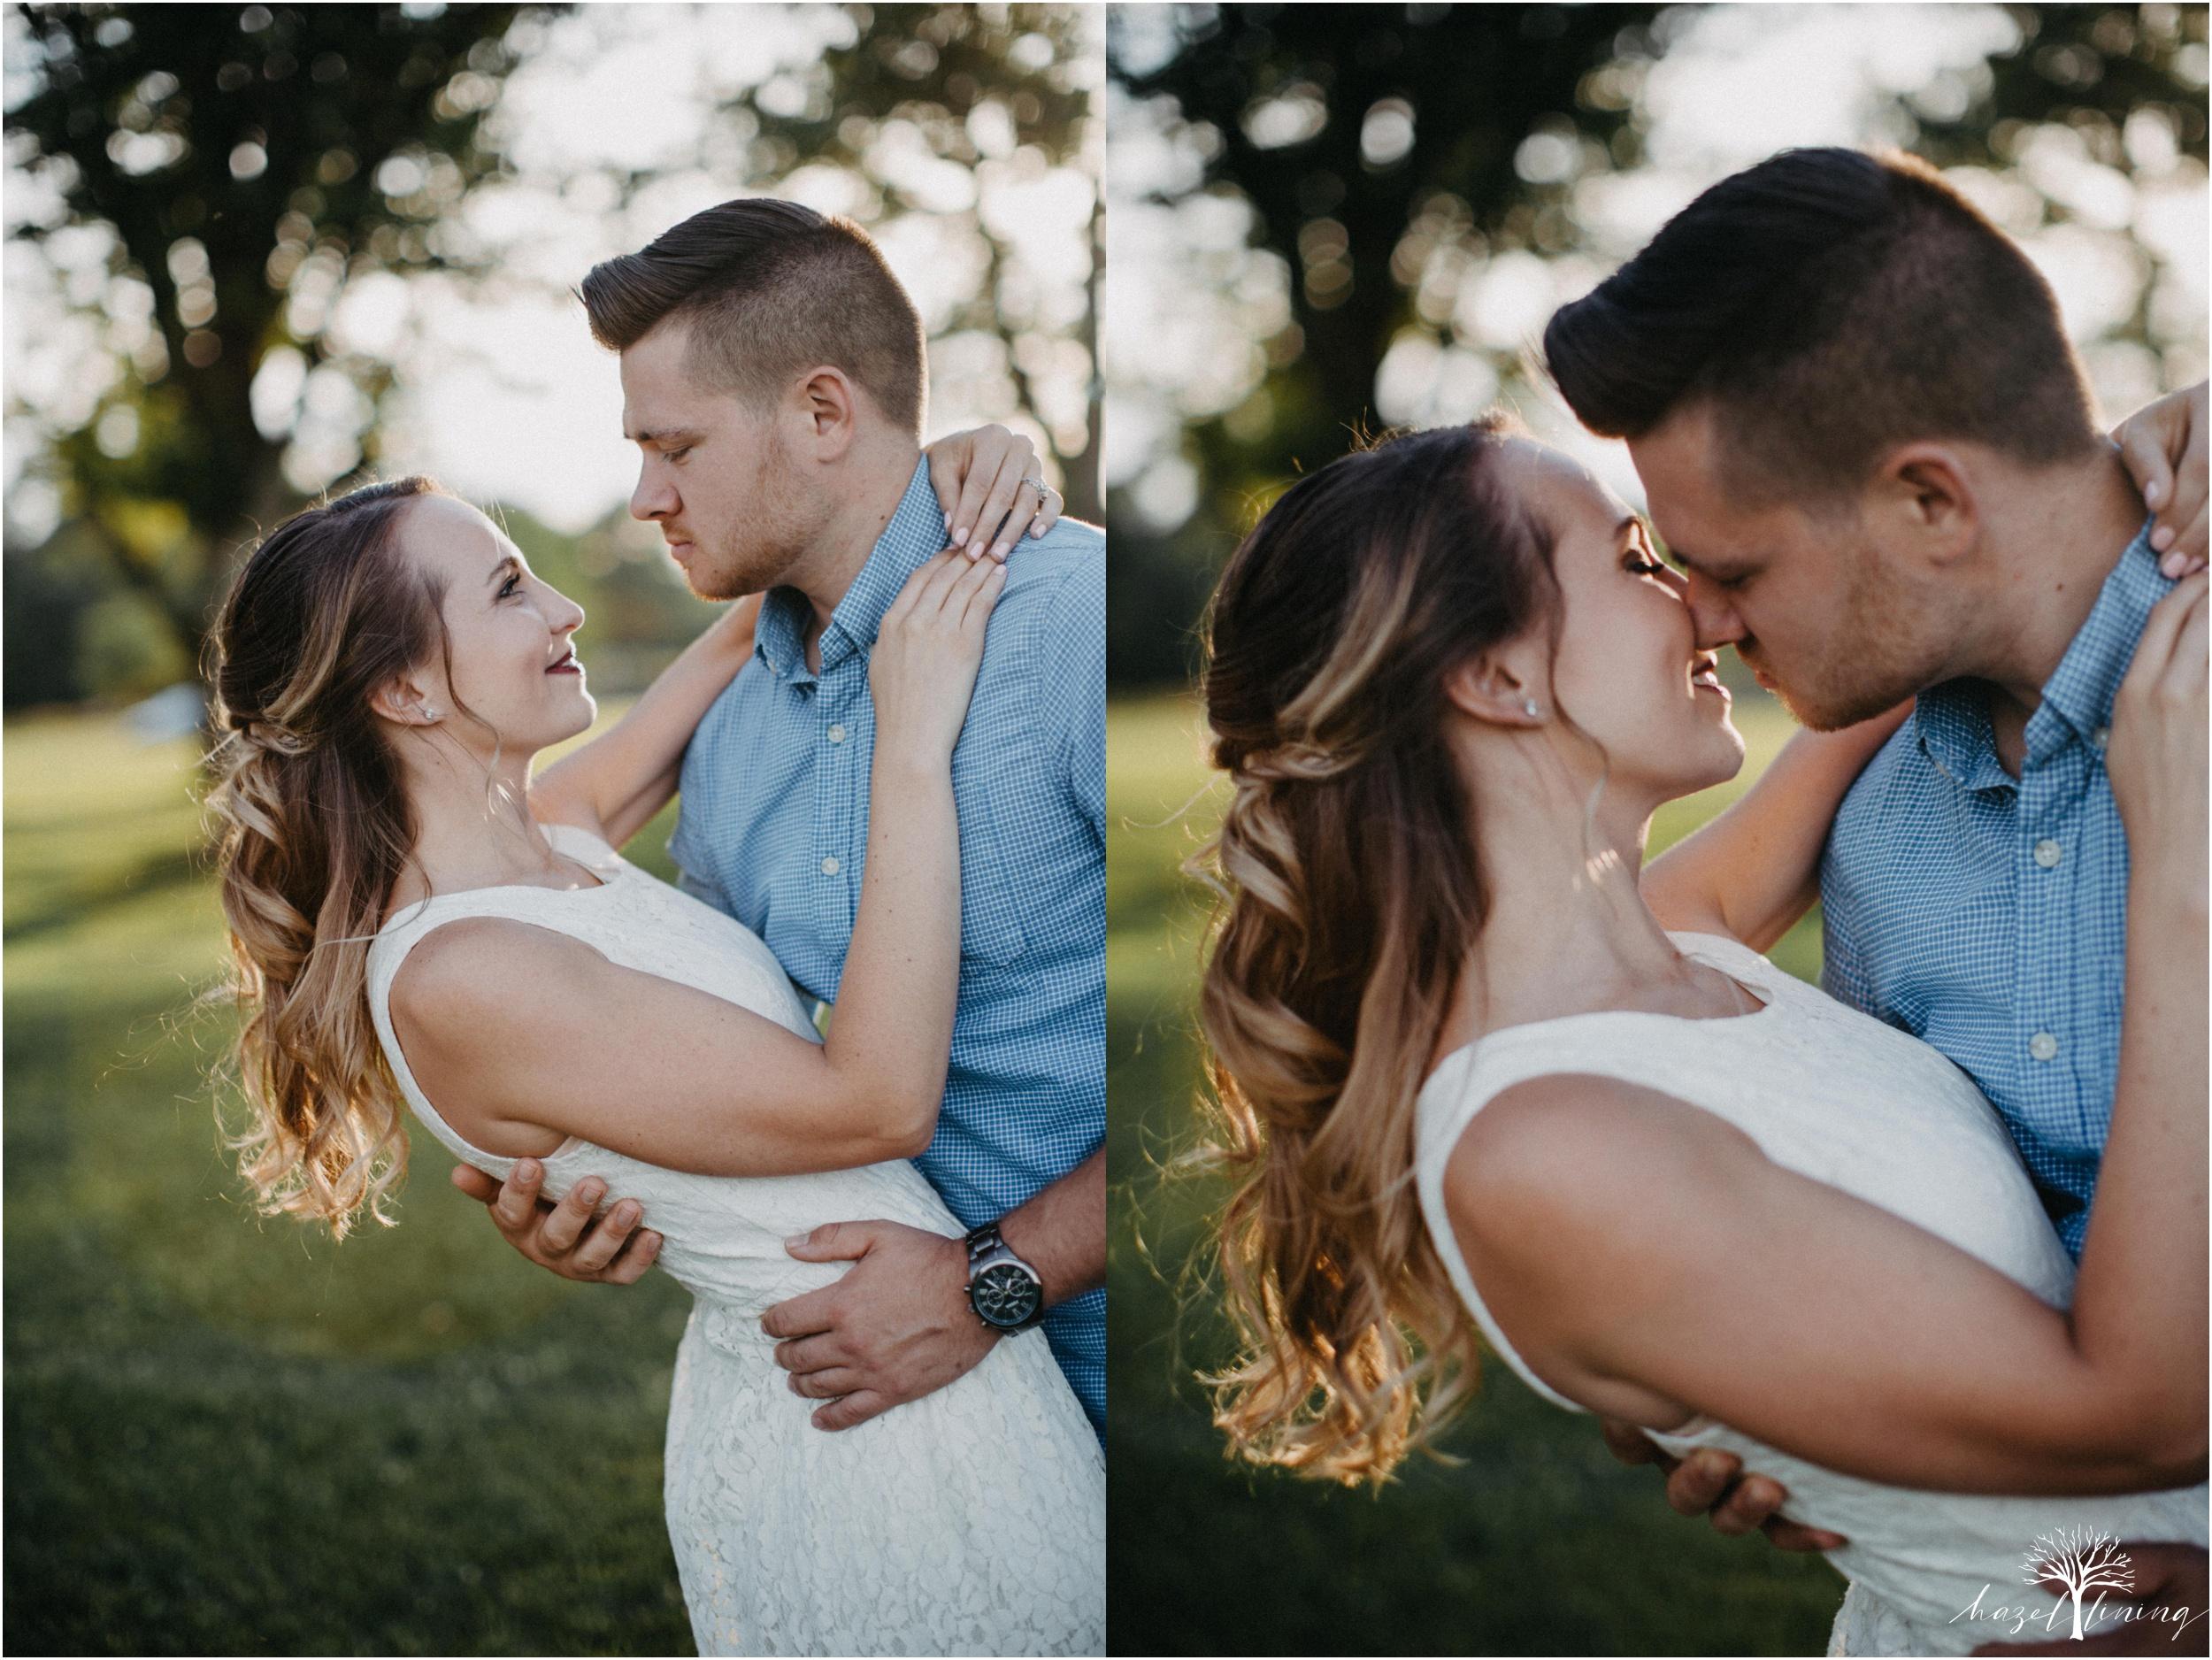 rachel-warner-chris-niedrist-the-farm-bakery-and-events-quakertown-pa-summer-engagement-hazel-lining-photography-destination-elopement-wedding-engagement-photography_0021.jpg